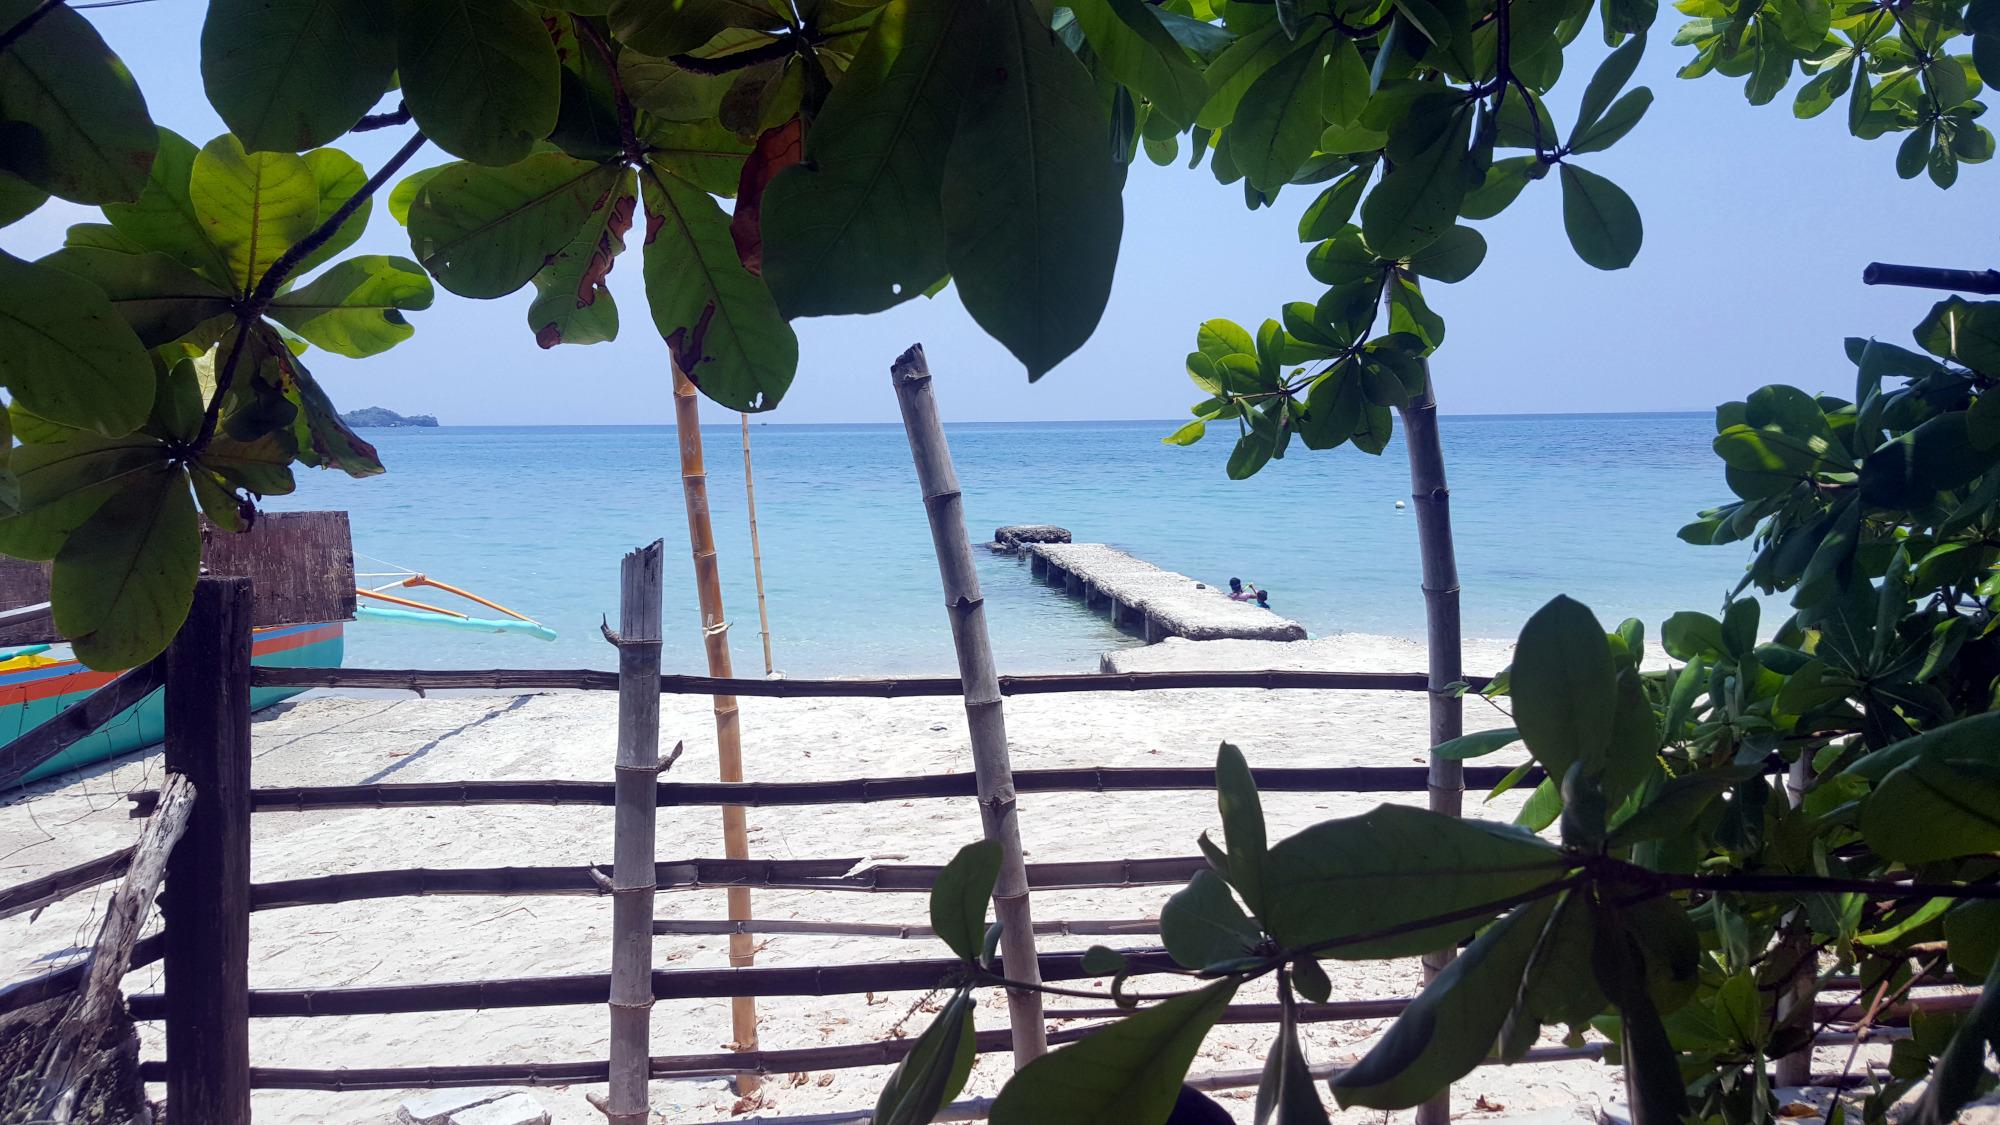 Brgy. Tambobong, Da Sol, Pangasinan, Philippines